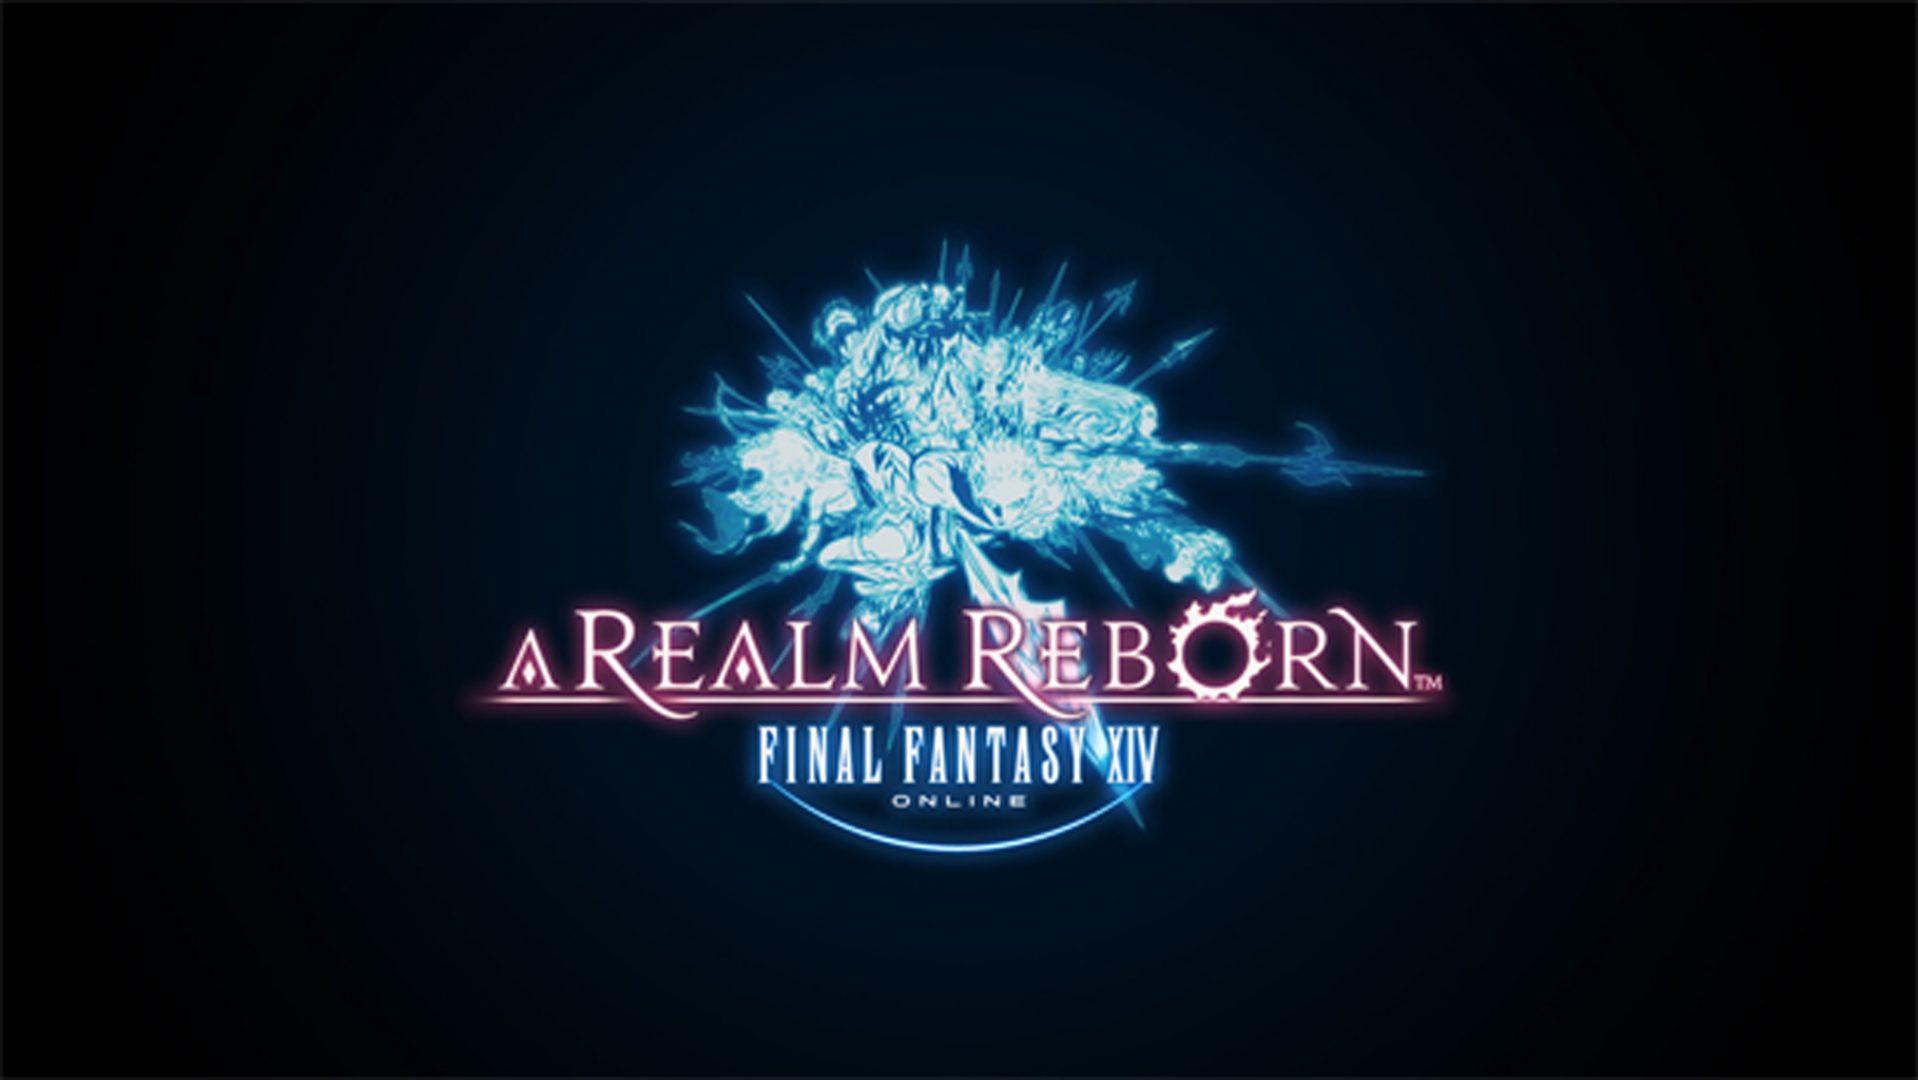 Free Login Weekend For Final Fantasy XIV: A Realm Reborn